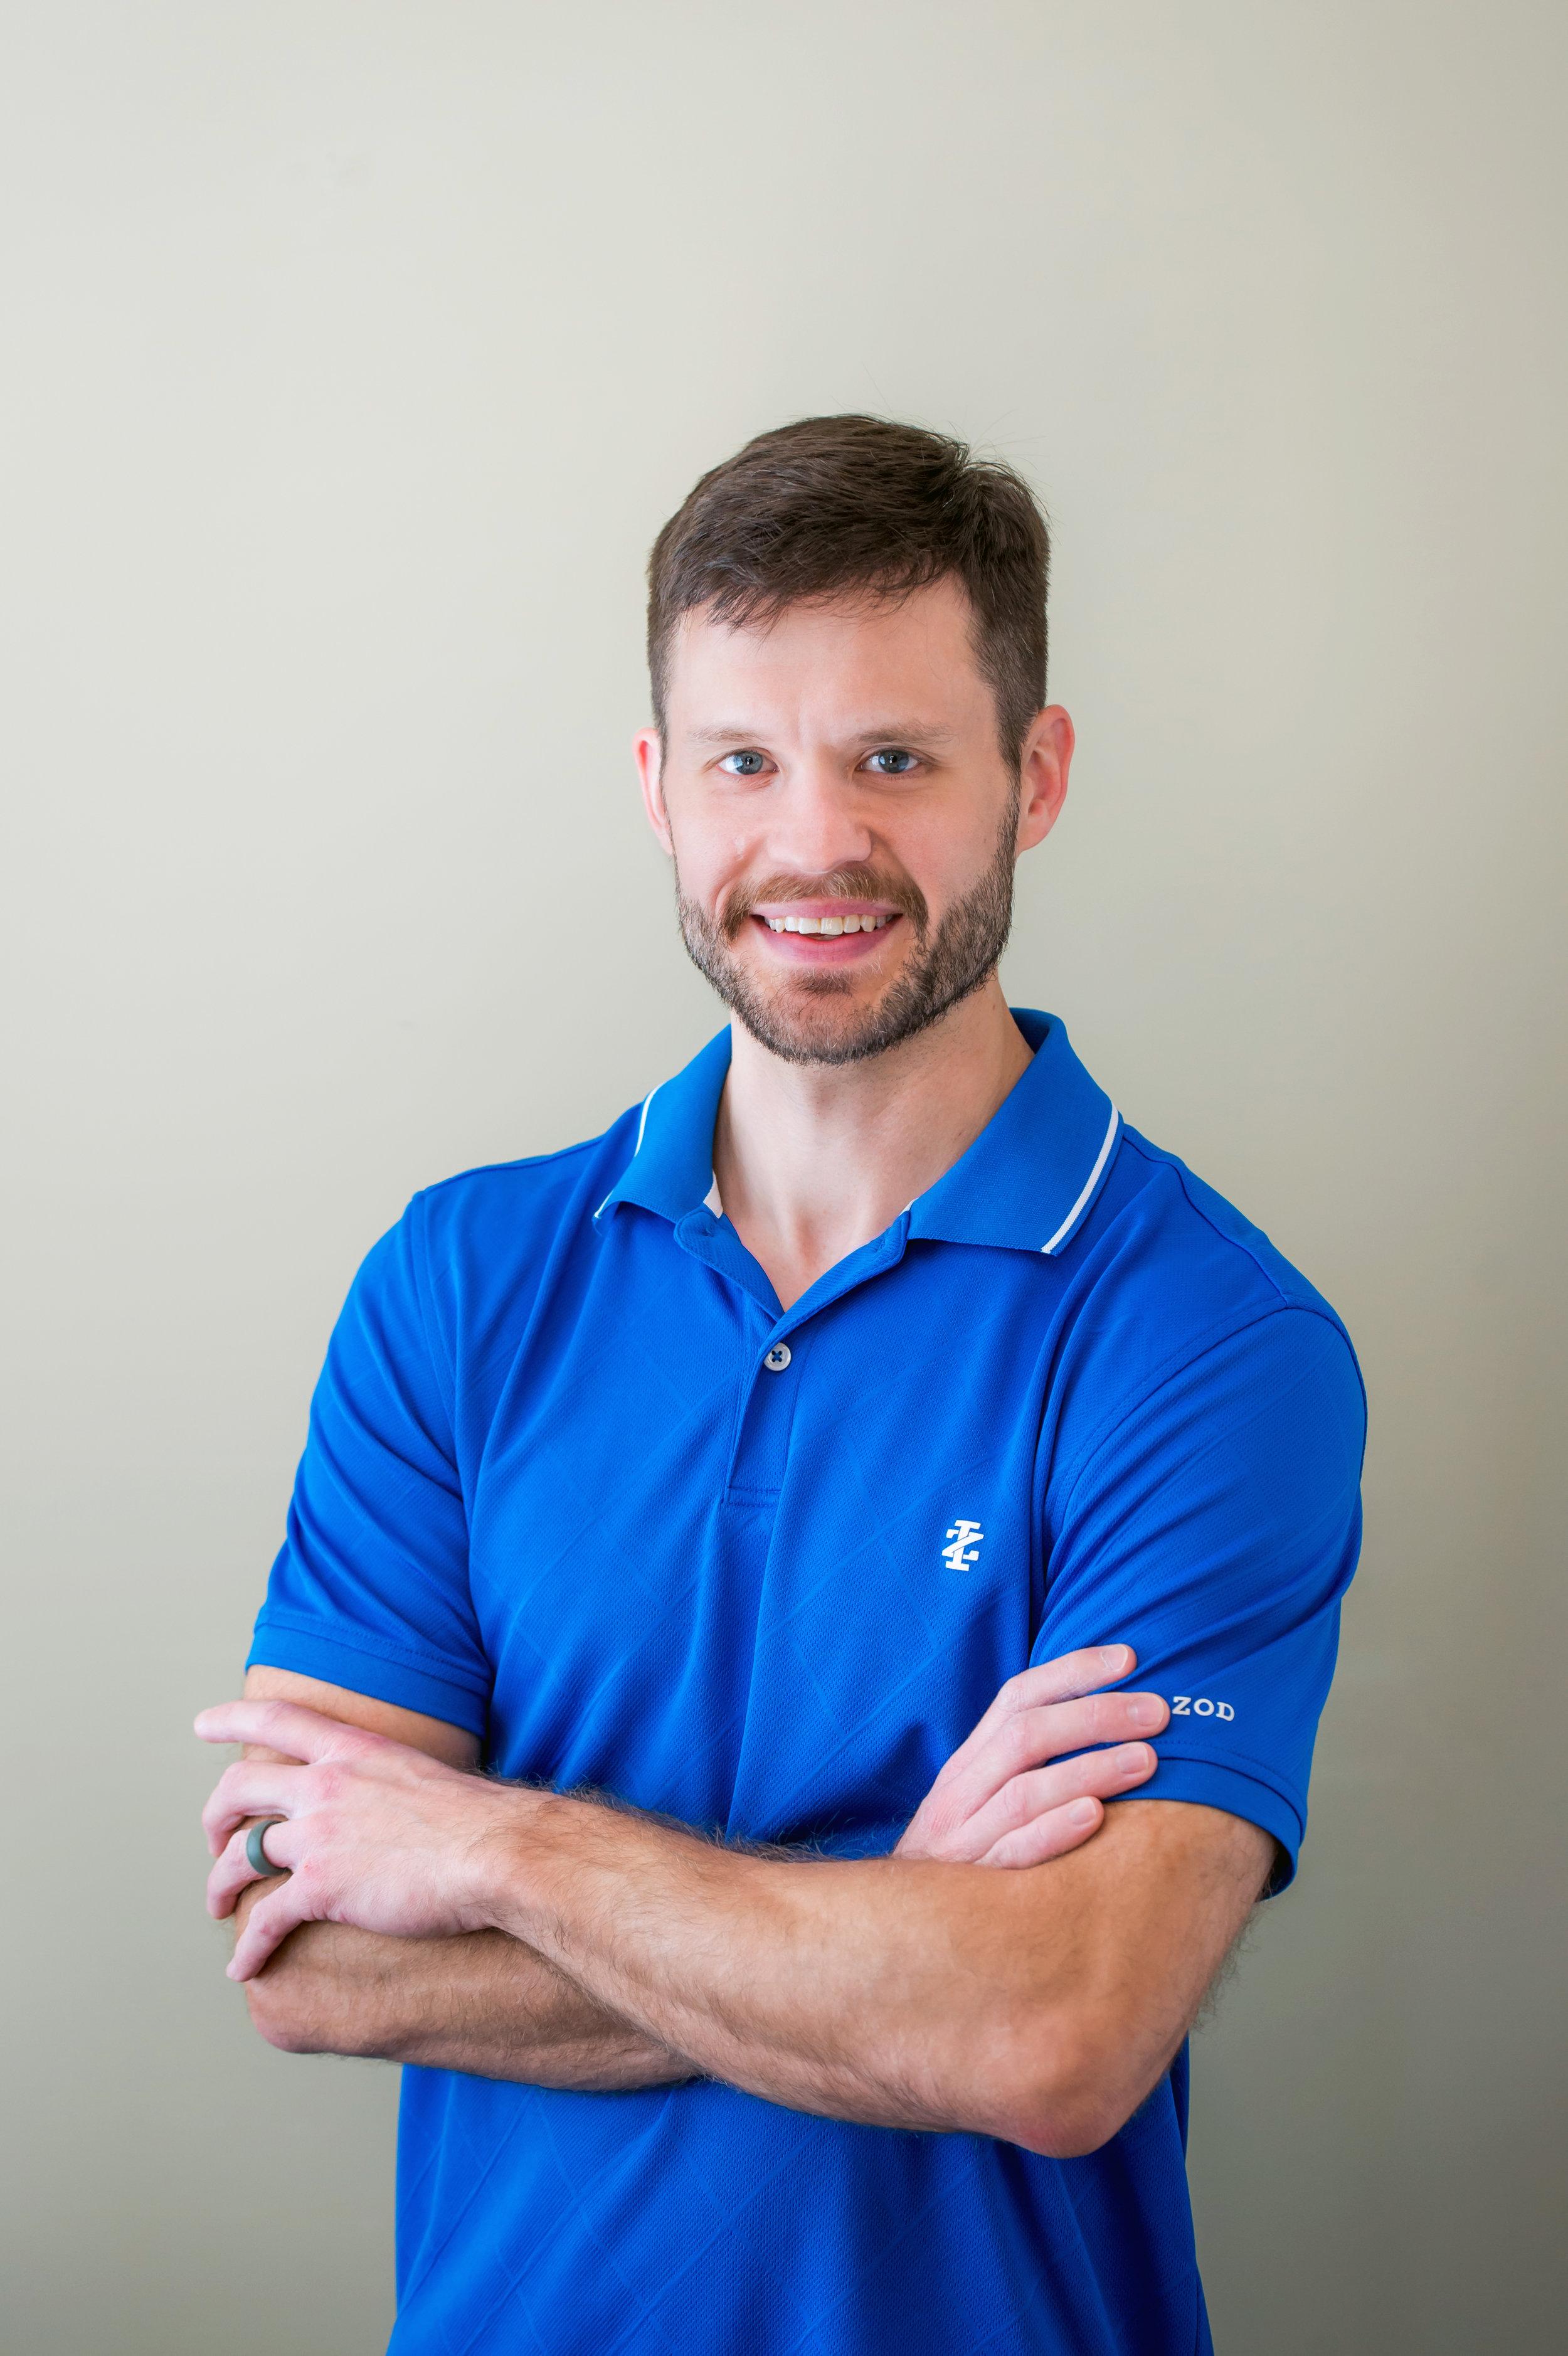 Dr. Ryan Godfrey (Physical Therapist)